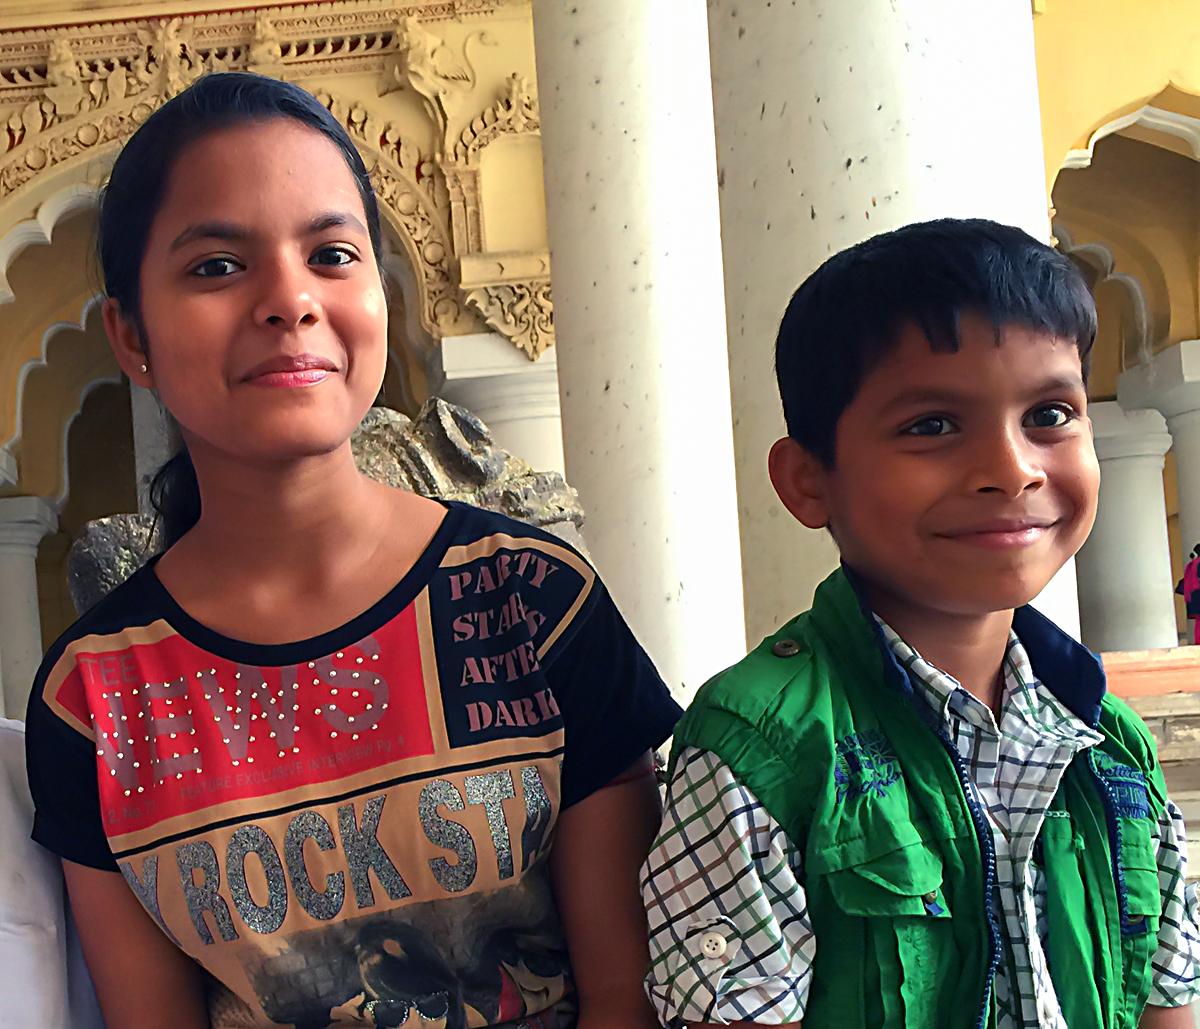 INDIEN Chennai Kanchipuram Tempel Menschen Tempel FINEST-onTour 2140.jpg